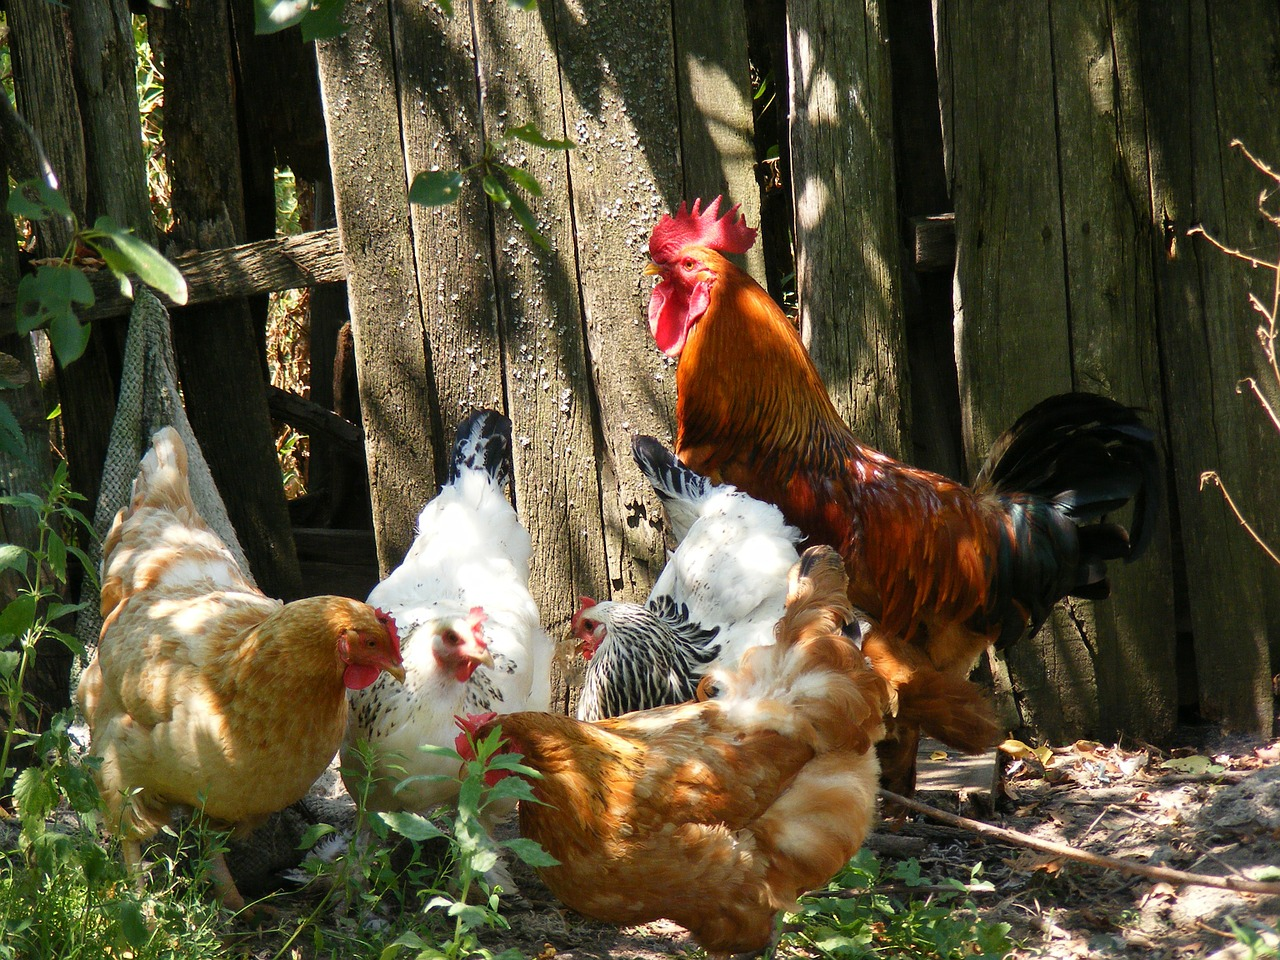 chicken-88507_1280.jpg